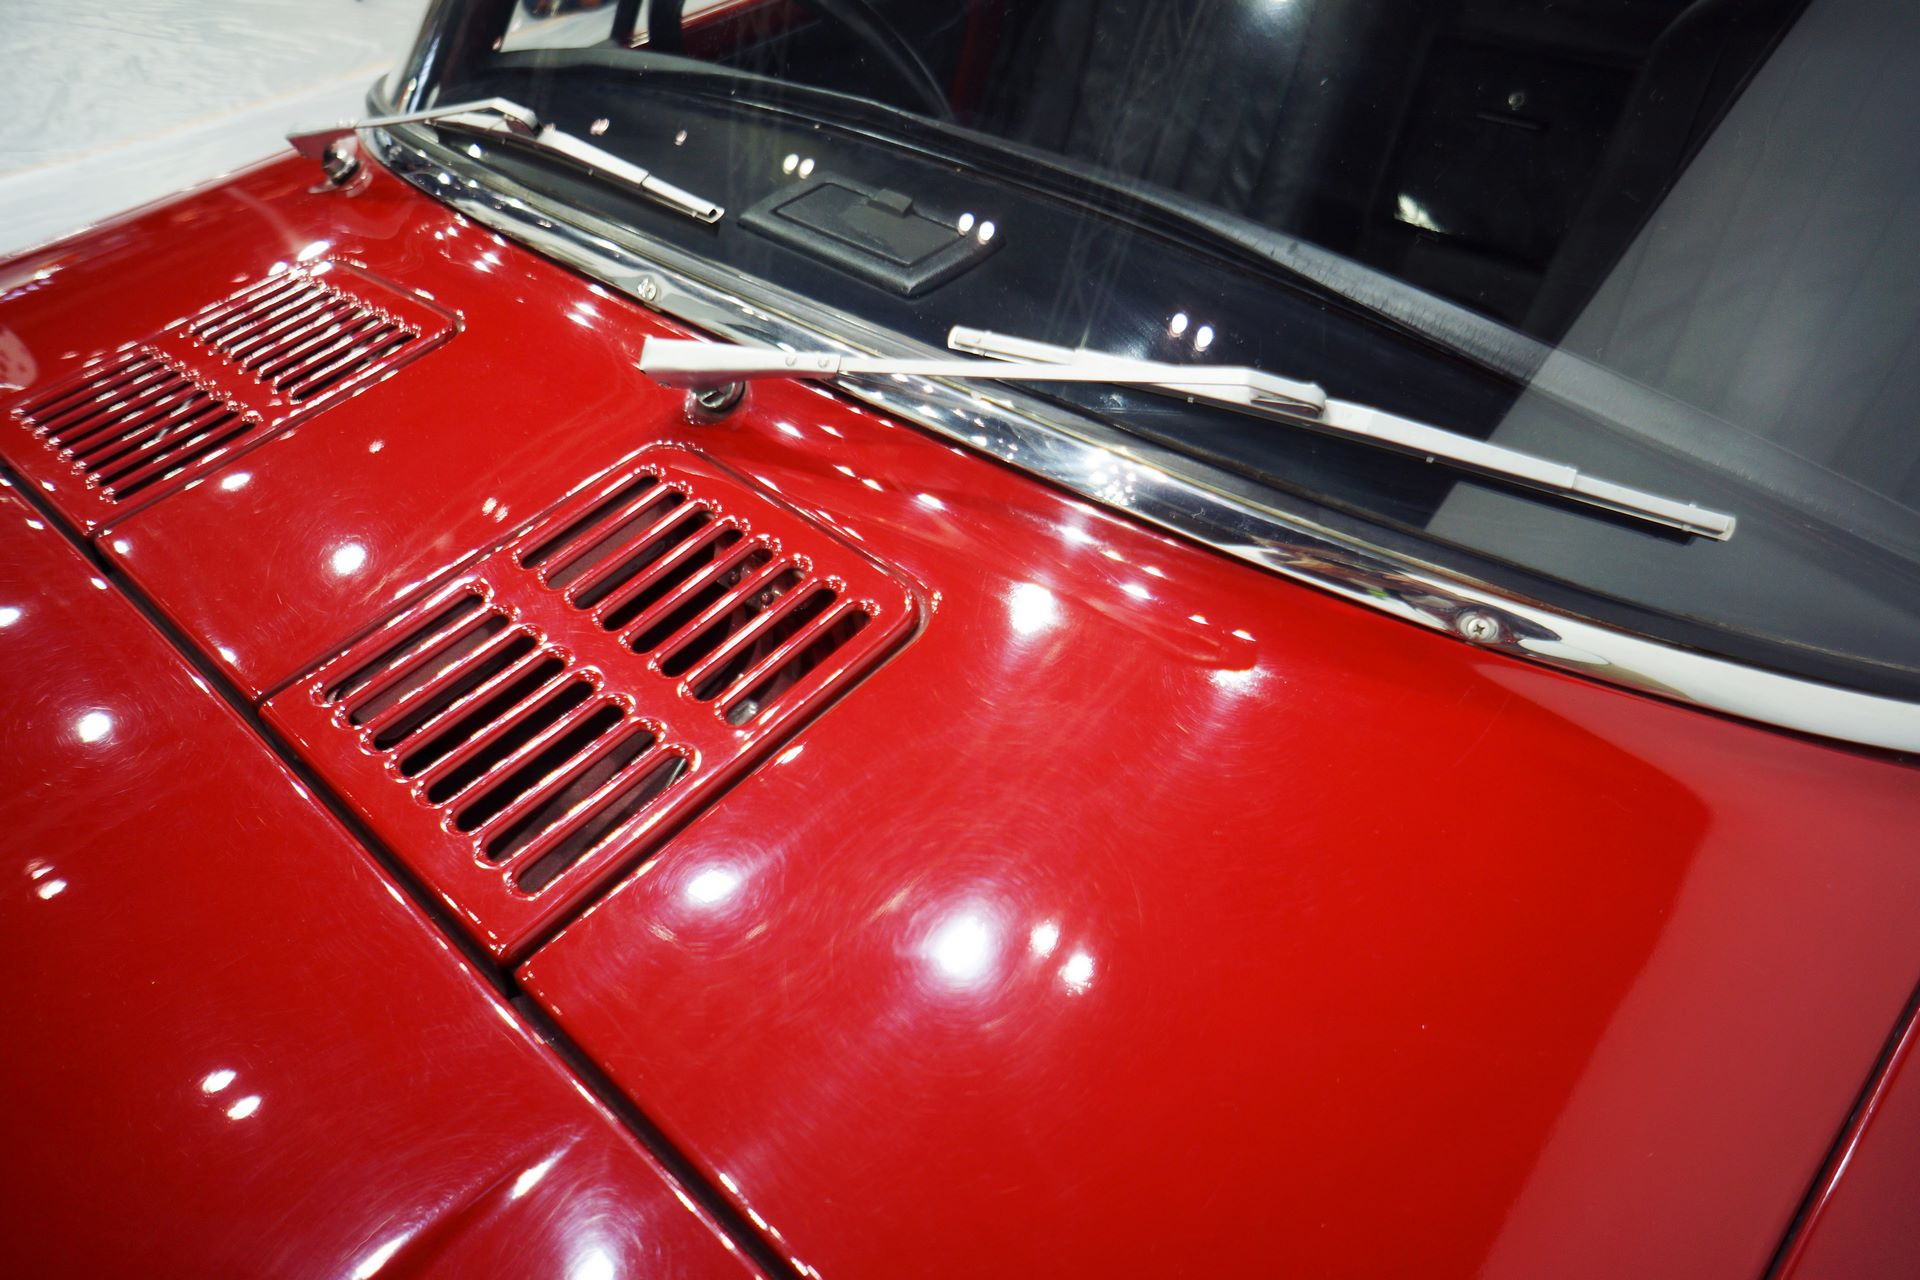 Toyota-Sports-800-Gas-Turbine-Hybrid-concept-1977-12